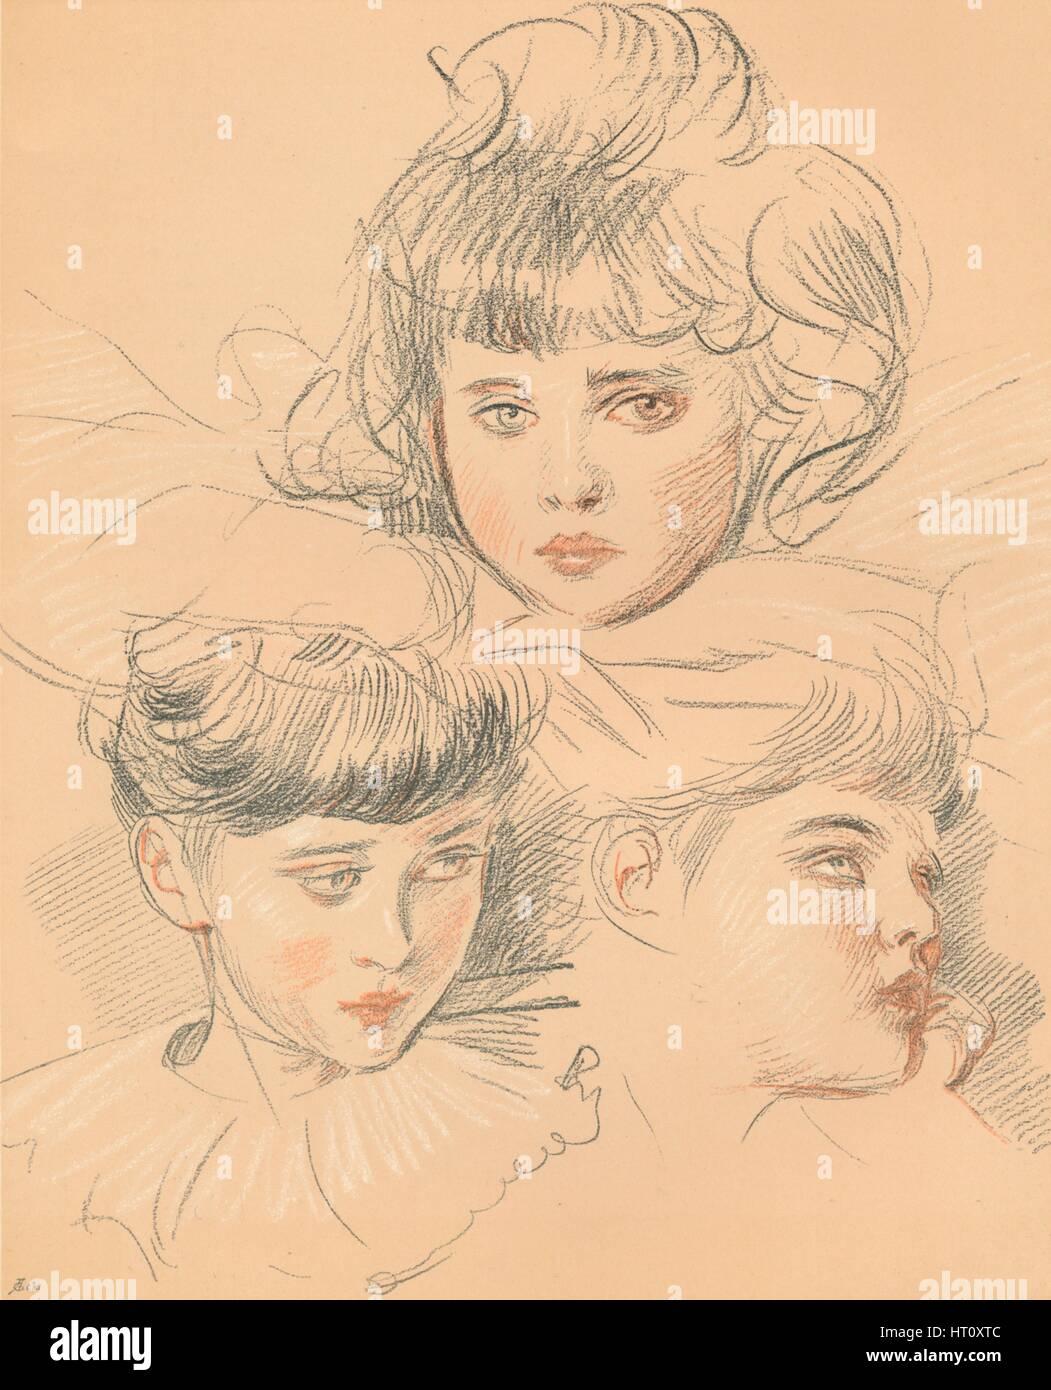 Un boceto para un retrato de niños, c 1897. Artista: Paul Helleu ...